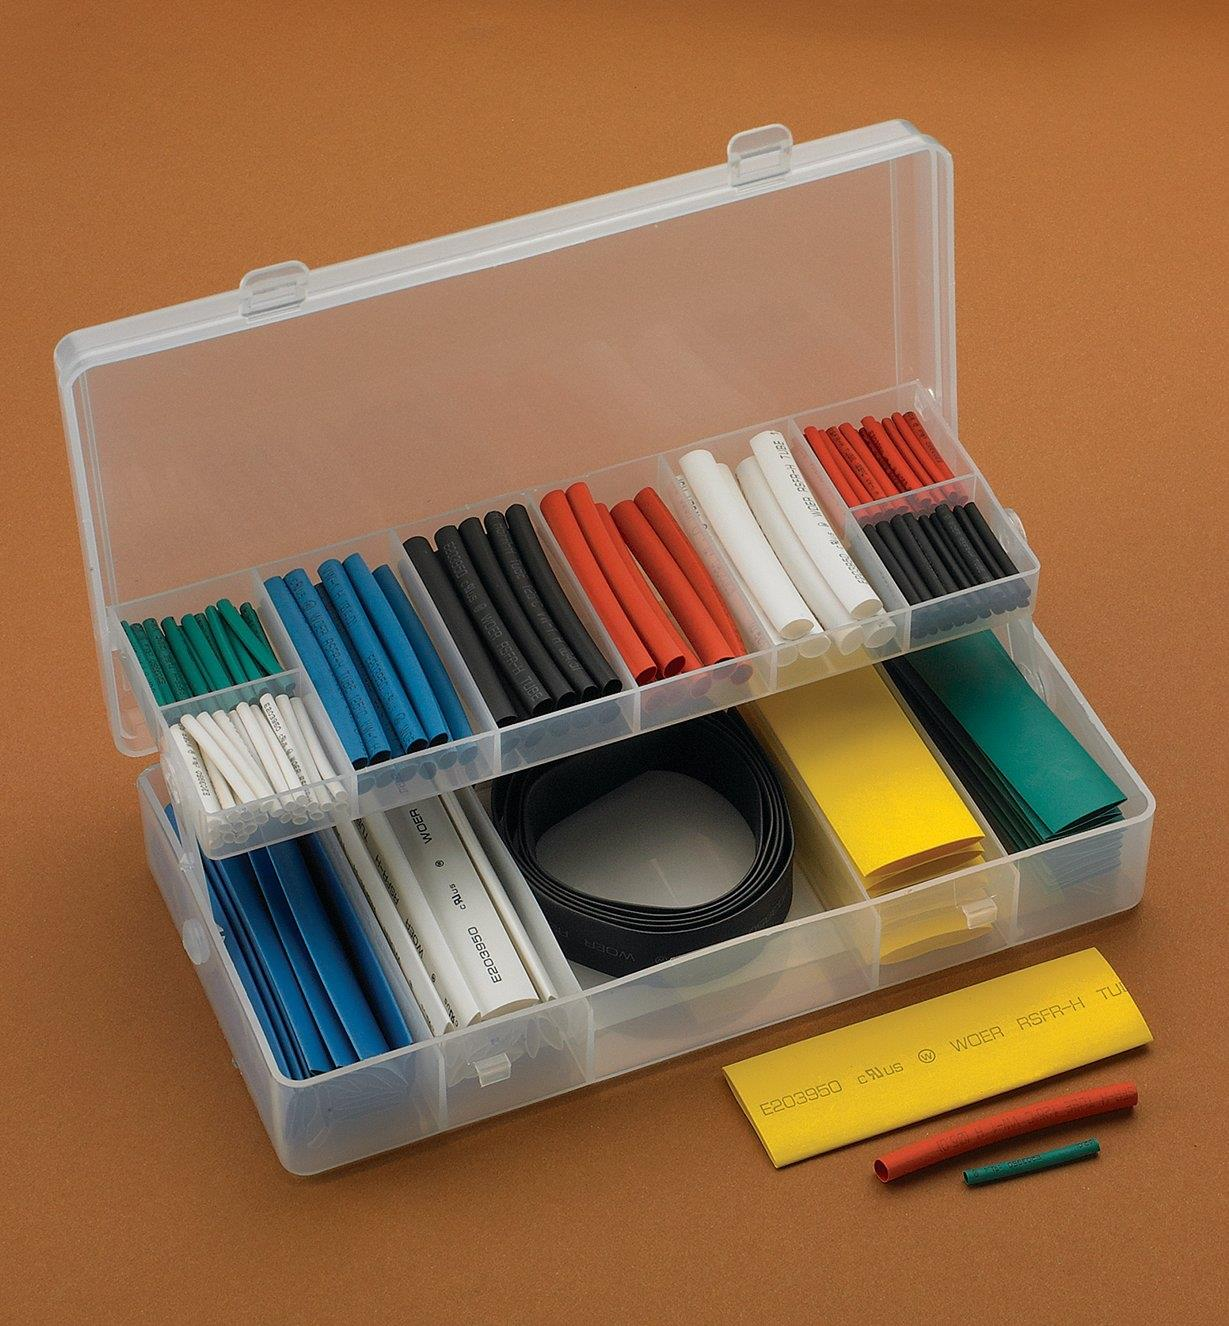 25K0150 - 171-Piece Shrink-Tubing Kit